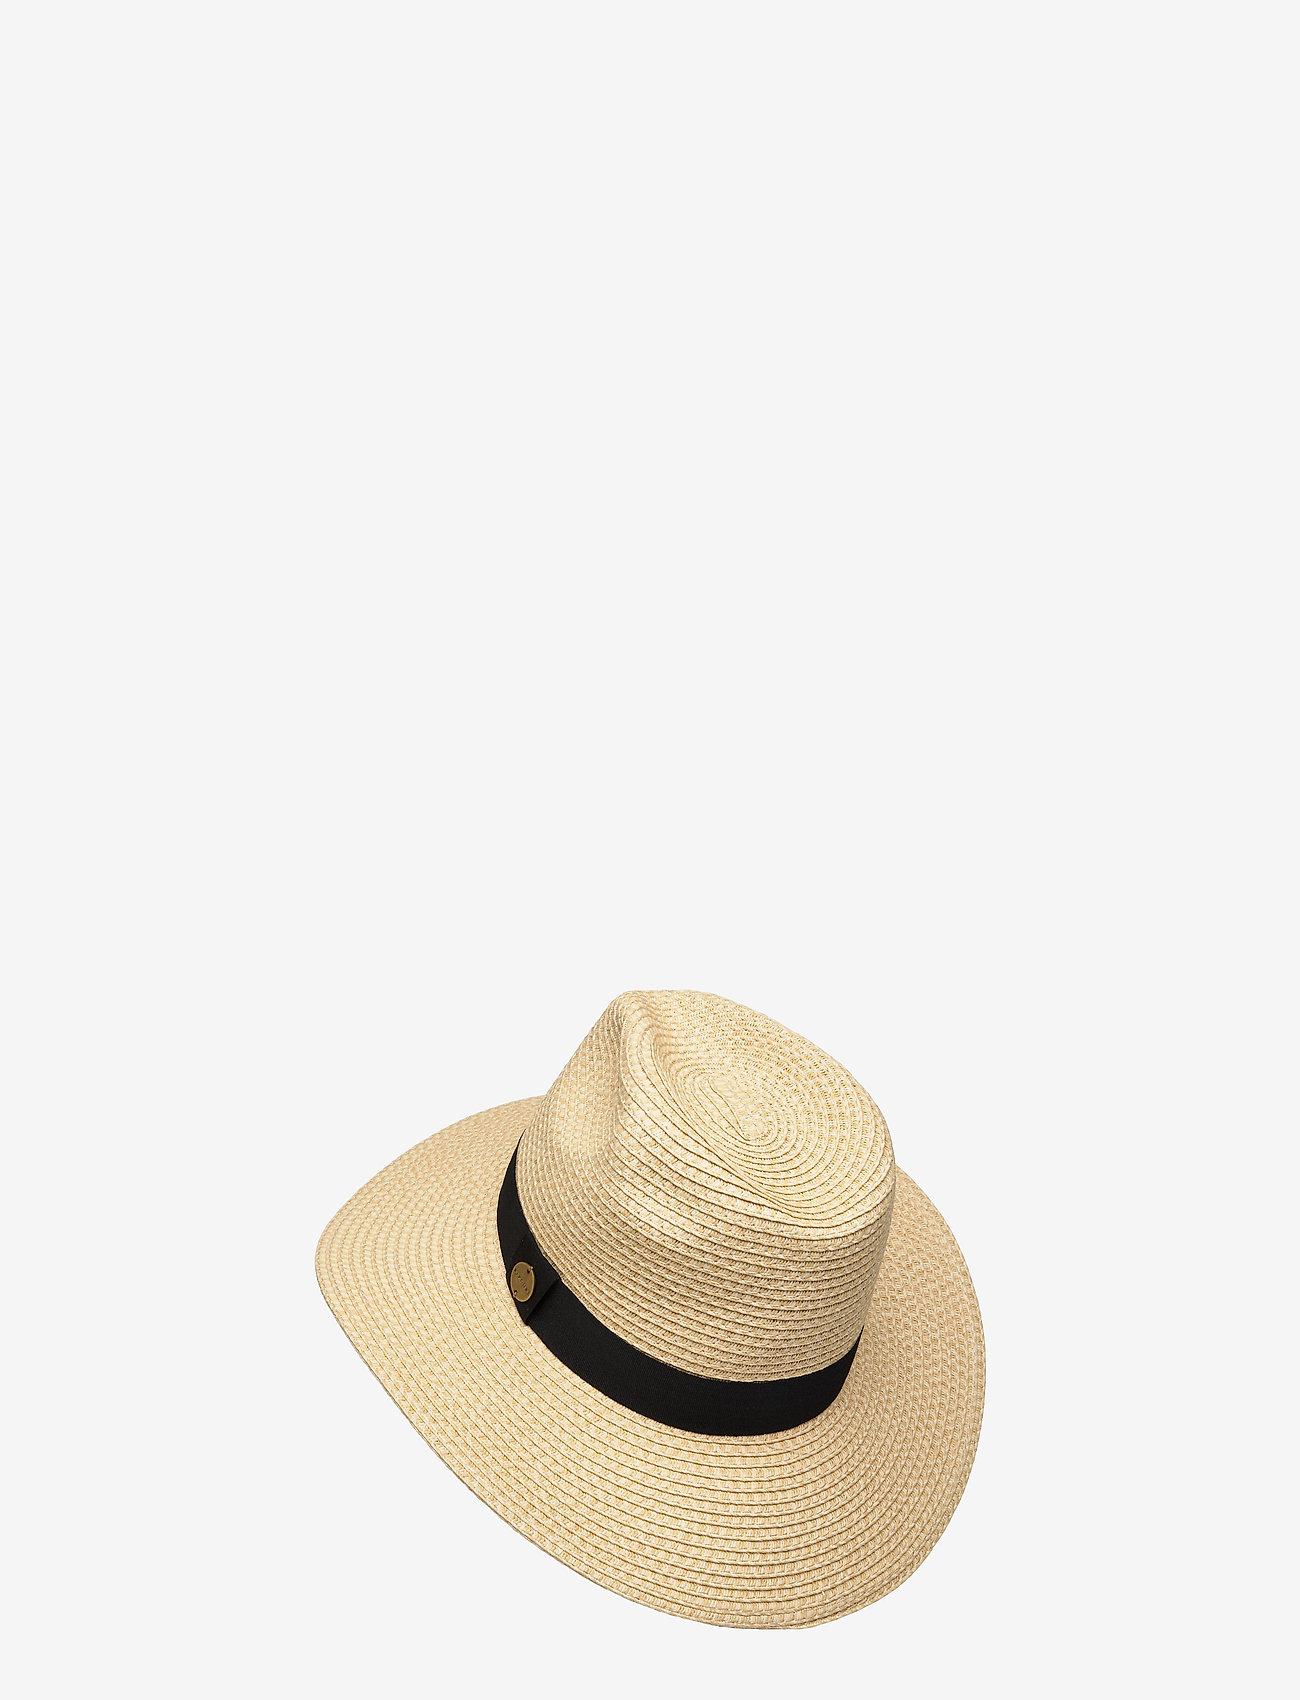 Rip Curl - DAKOTA PANAMA - bucket hats - natural - 1